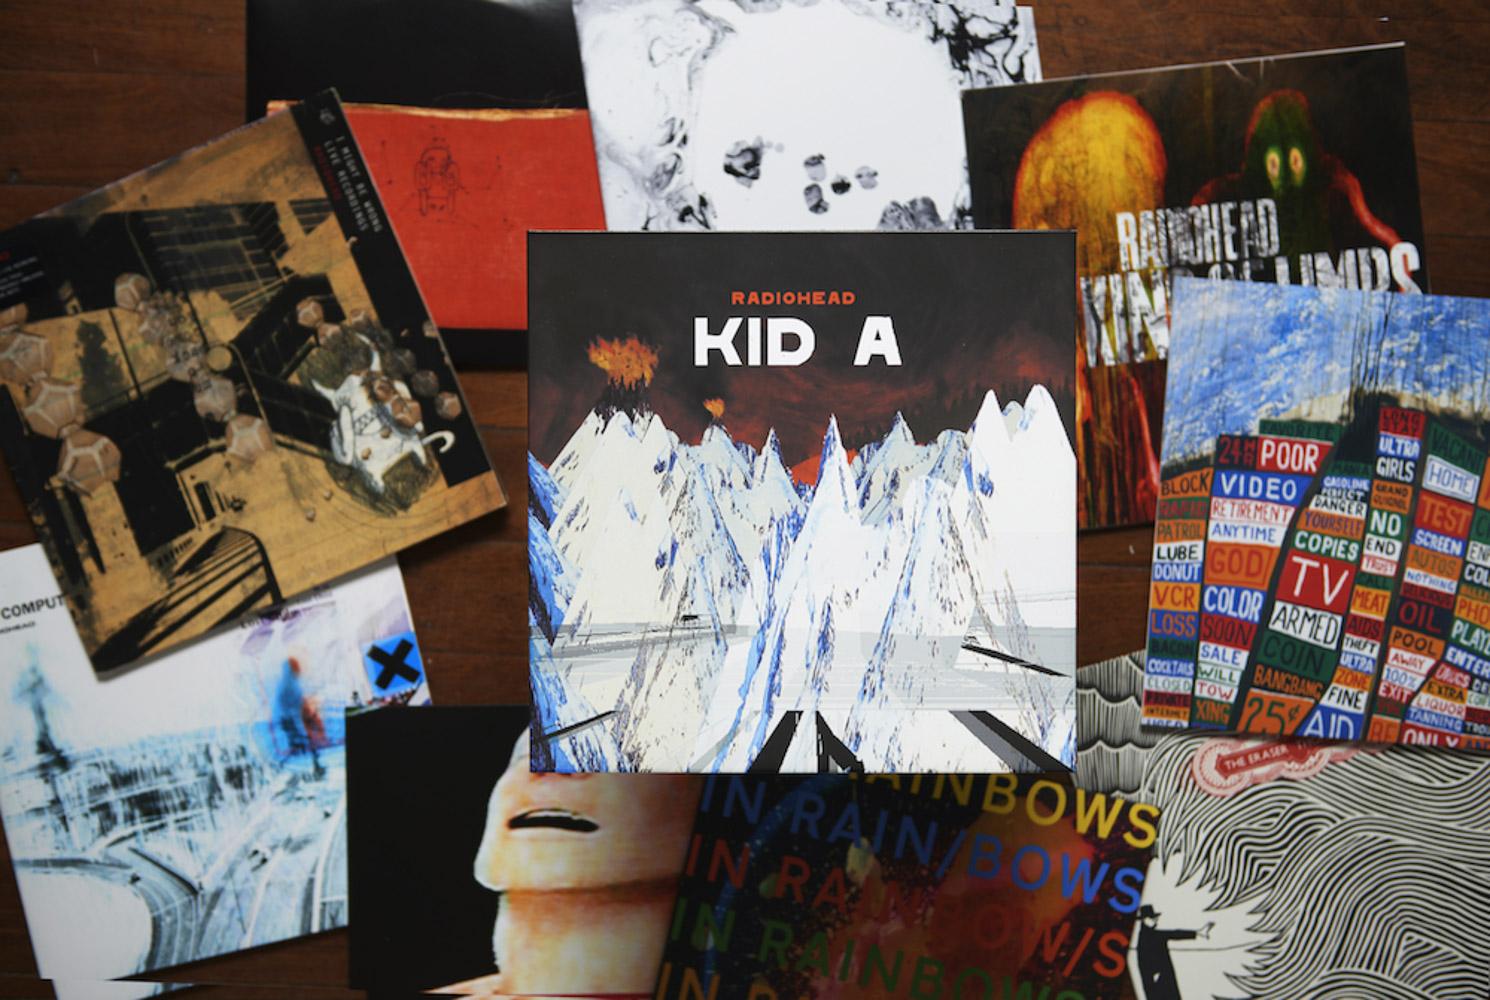 radiohead cds